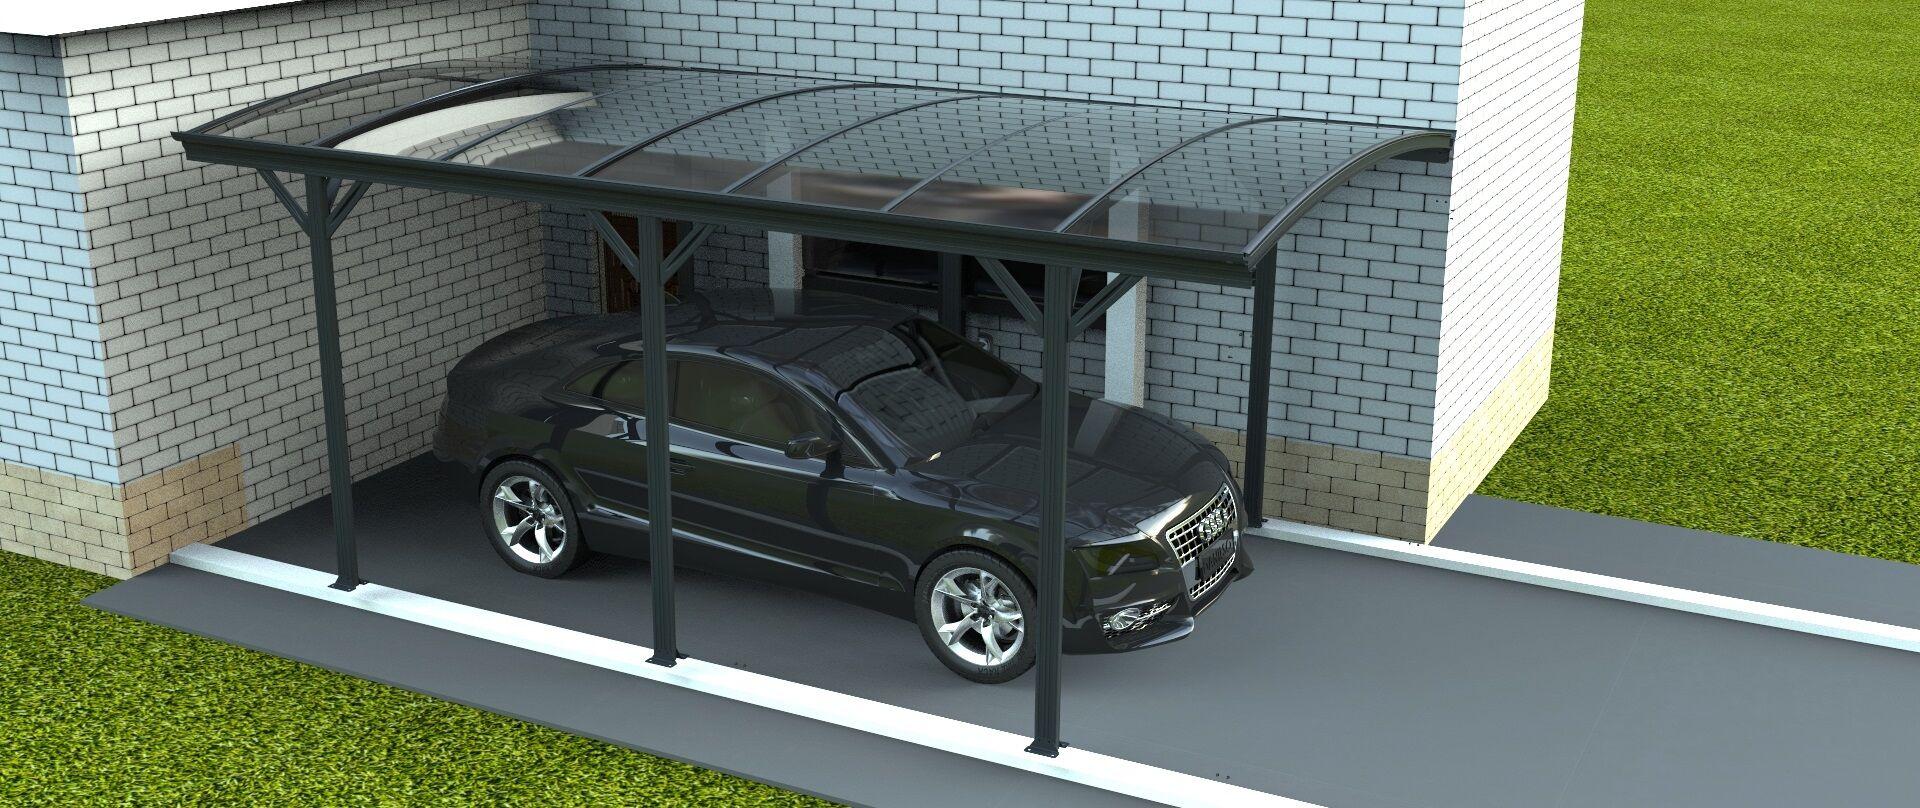 Bouvara carport, abri voiture 5,05x3m